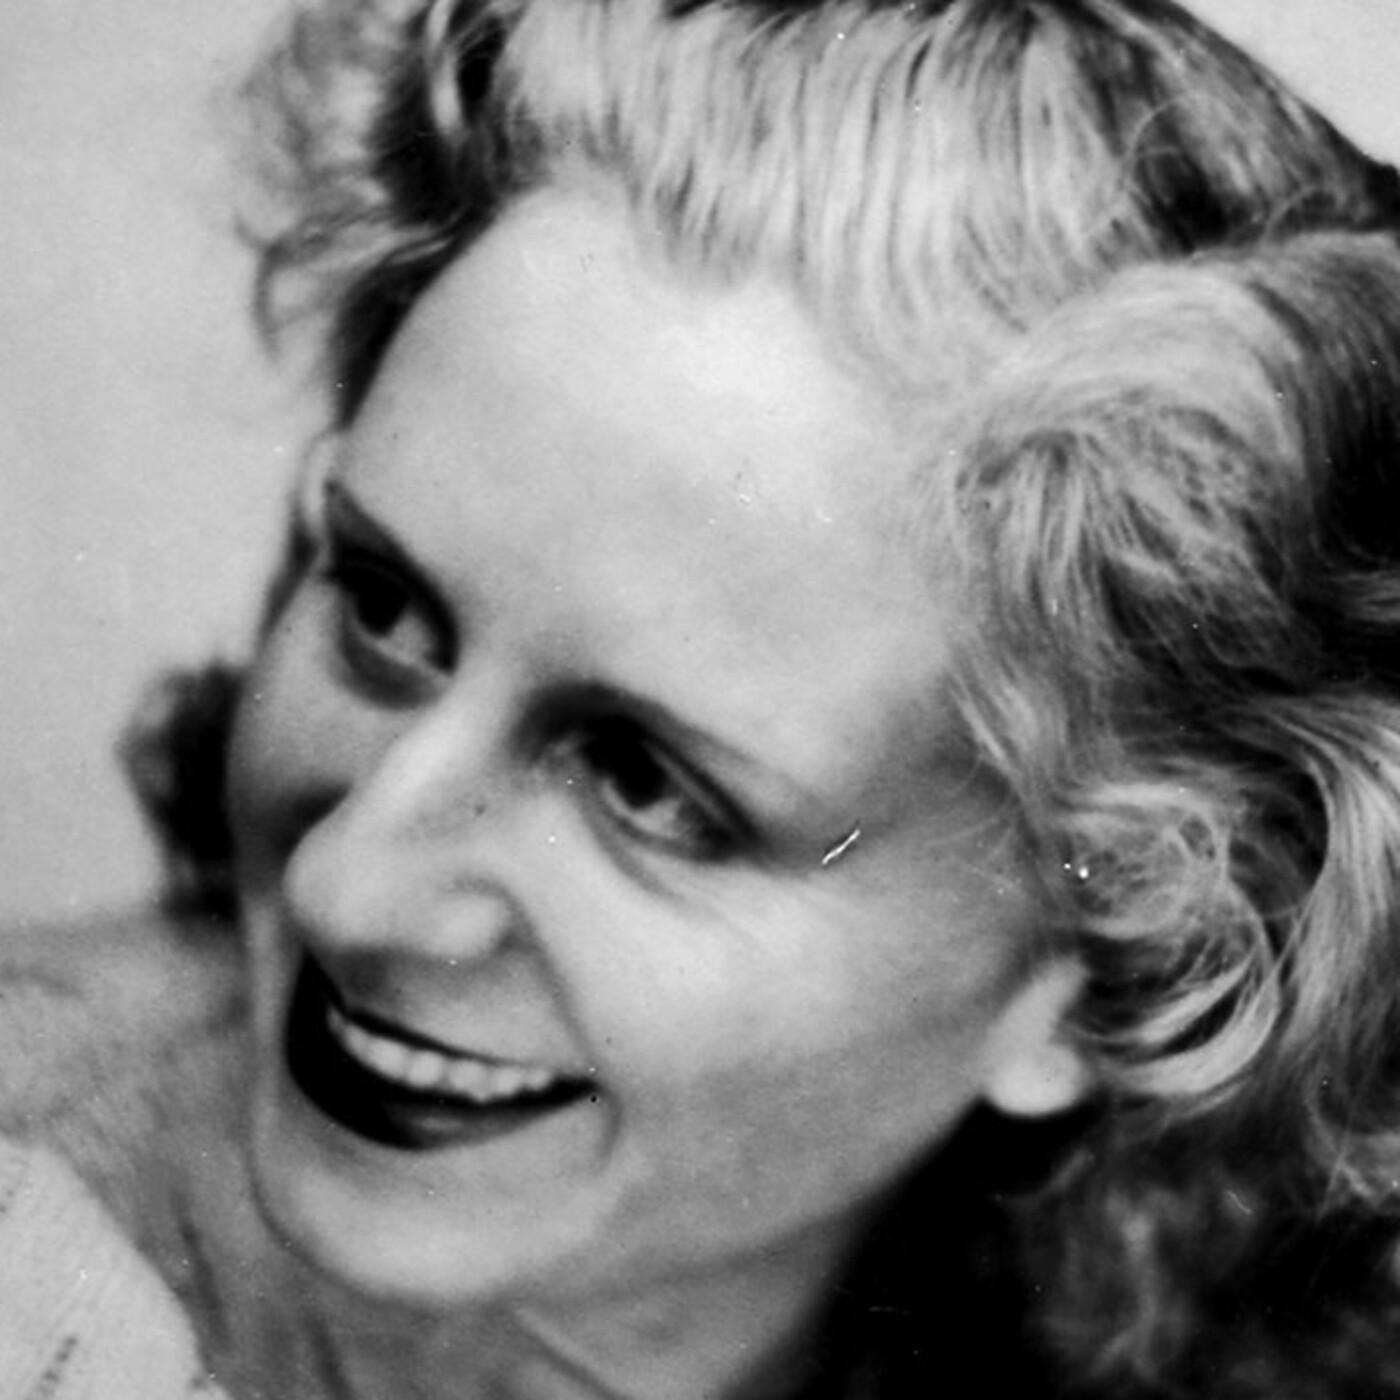 Mercè Rodoreda escritora guerra y postguerra Barcelona, La plaça del diamant y Mirall trencat, barrio de Gràcia